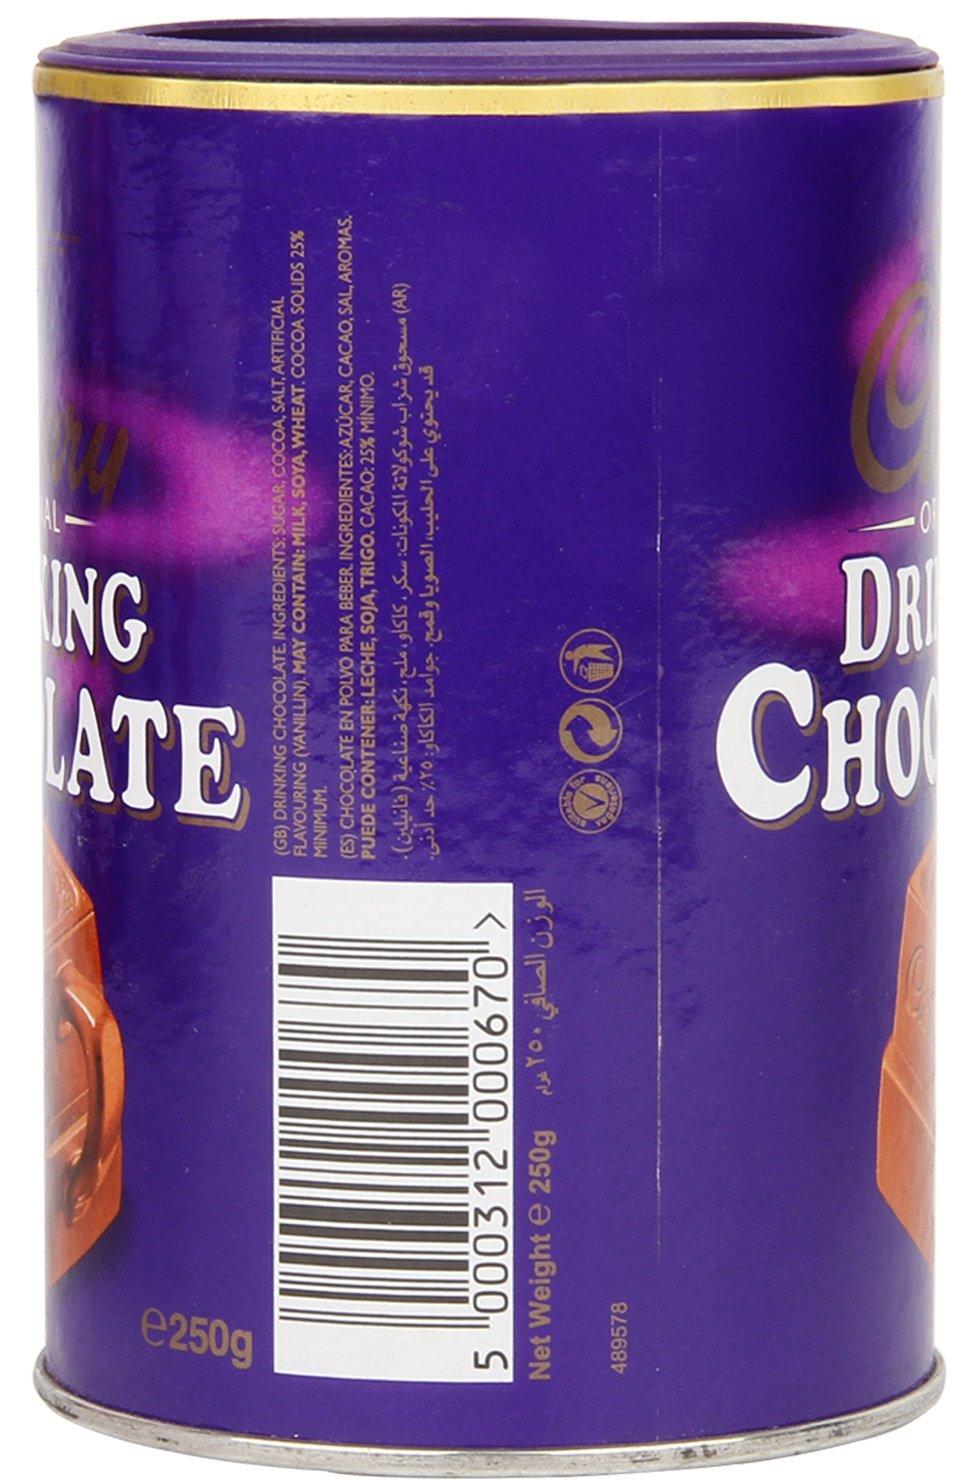 Cadbury Drinking Chocolate 250 gram (8.8oz)